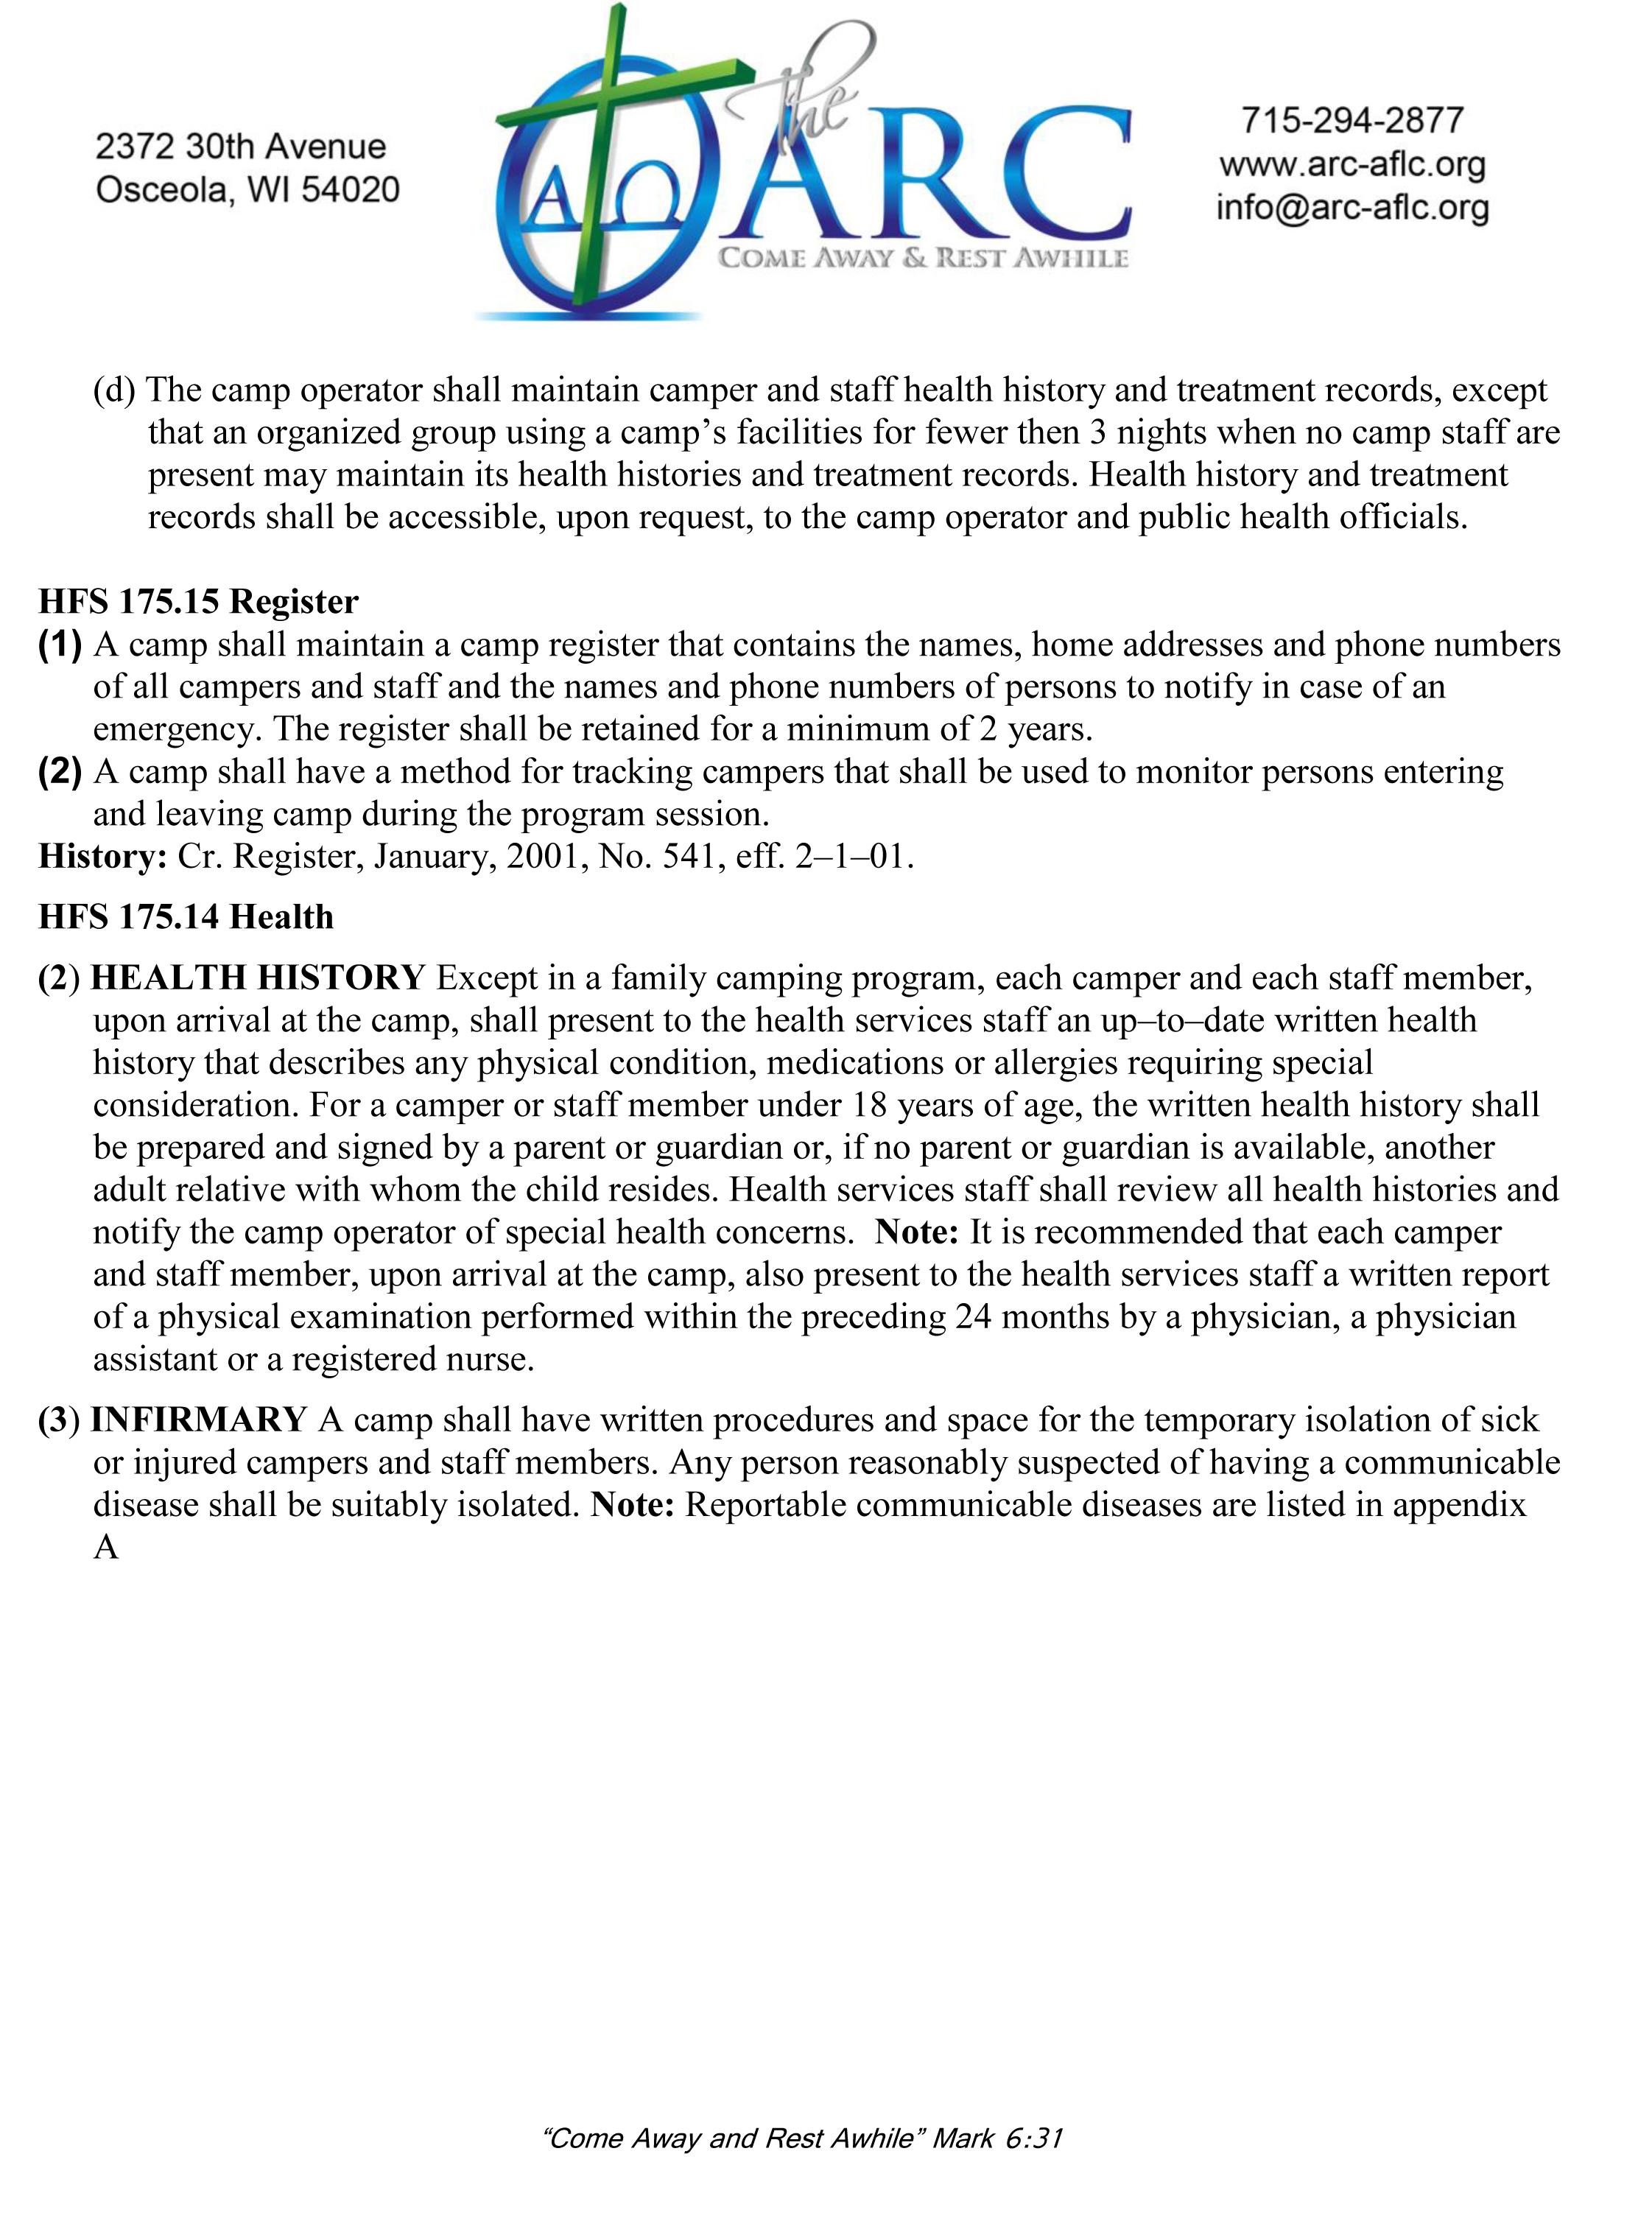 HFS 175 Youth Leader Responsibilities 2.jpg